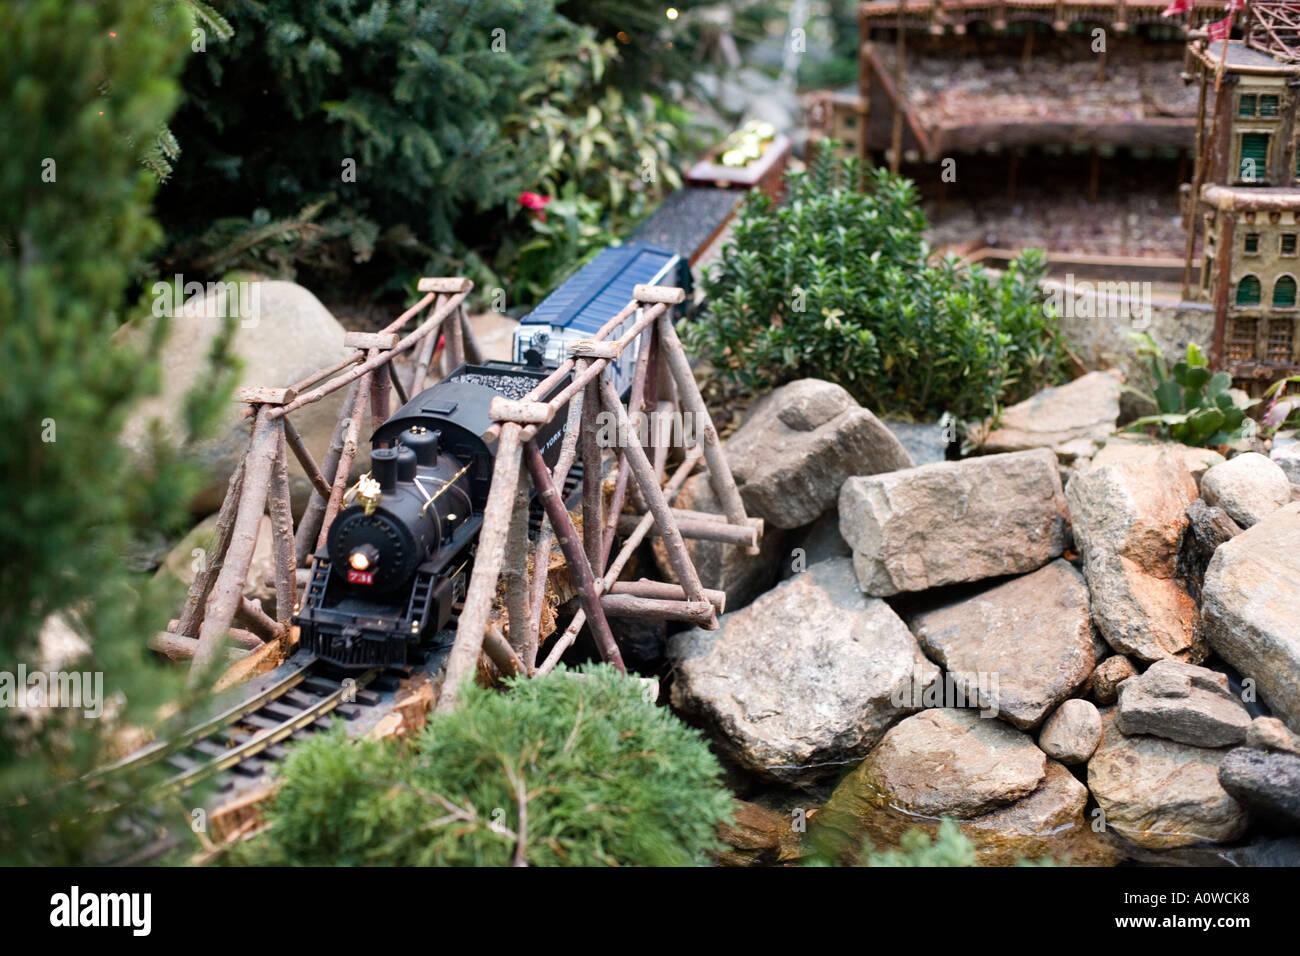 NY Botanical Gardens Annual Christmas Train Show